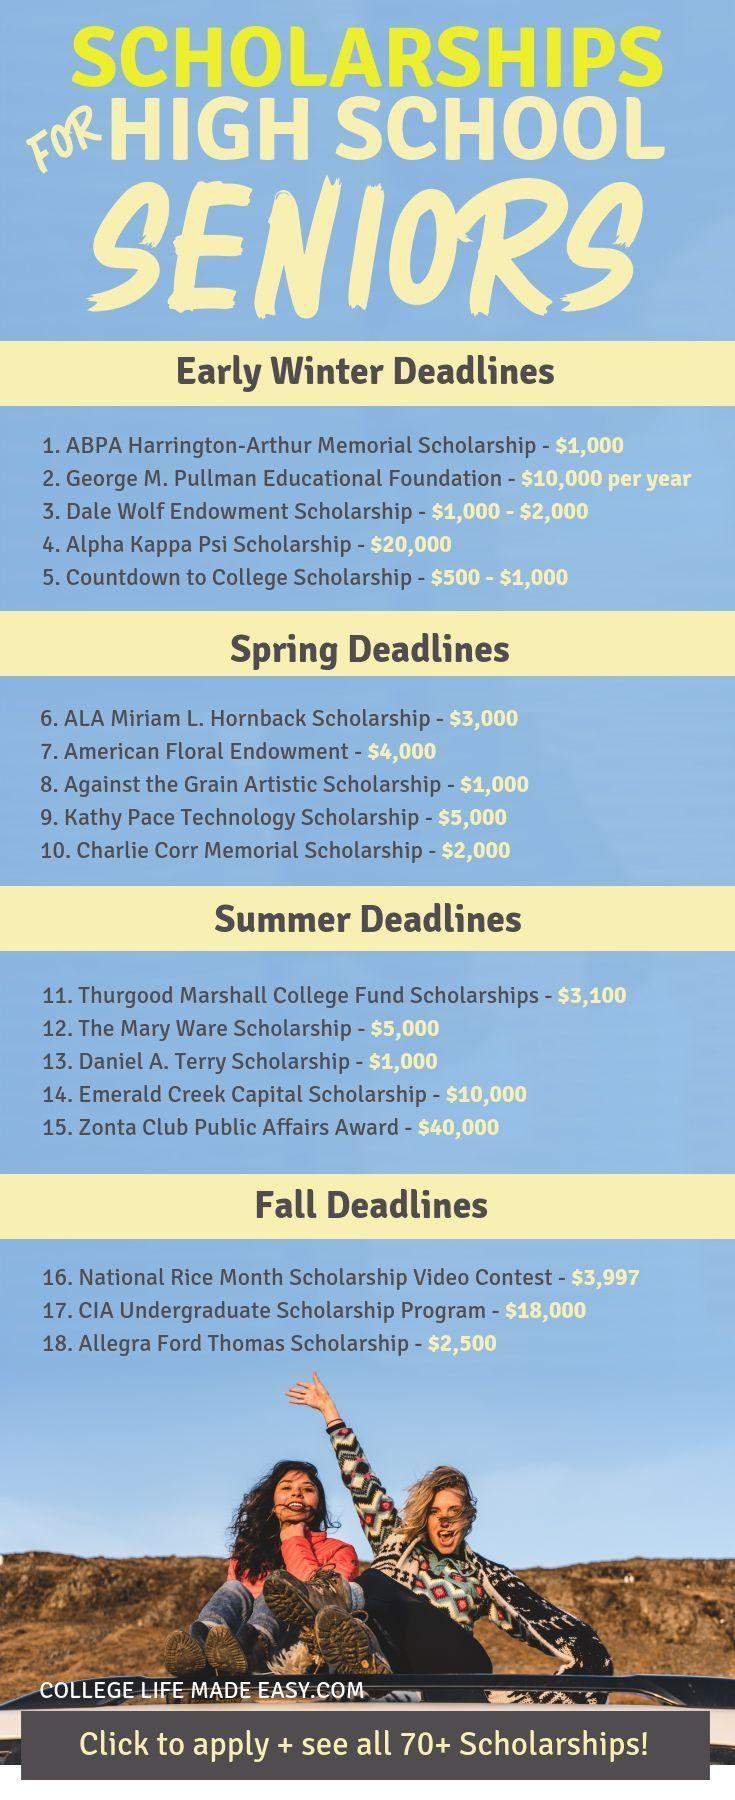 70+ Scholarships for High School Seniors: The Go-To List for 2019